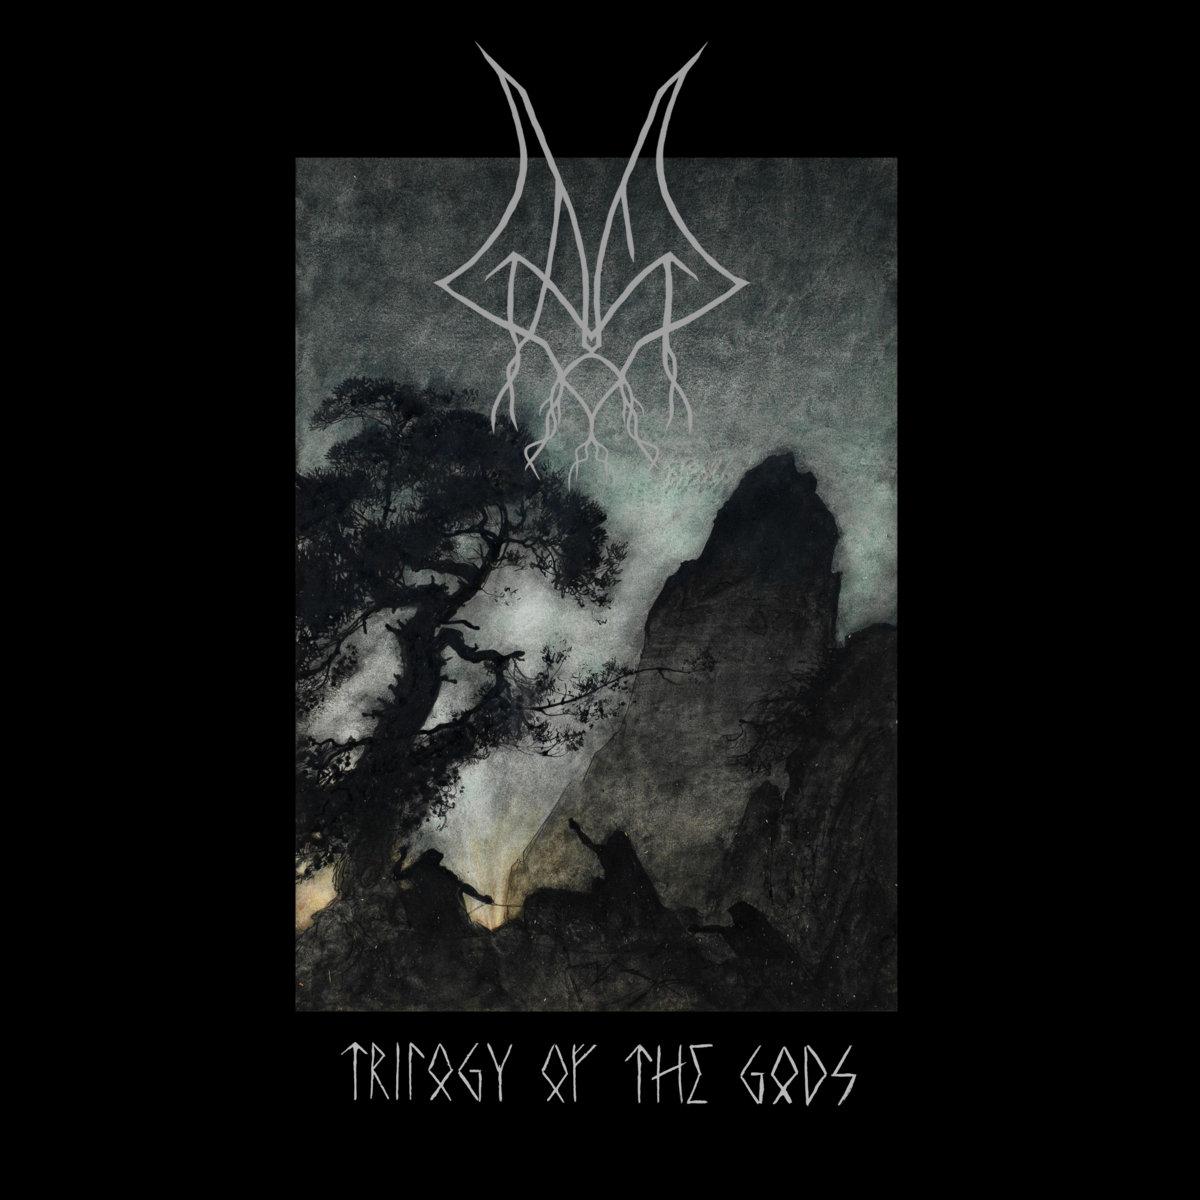 GAFR - Trilogy of the Gods